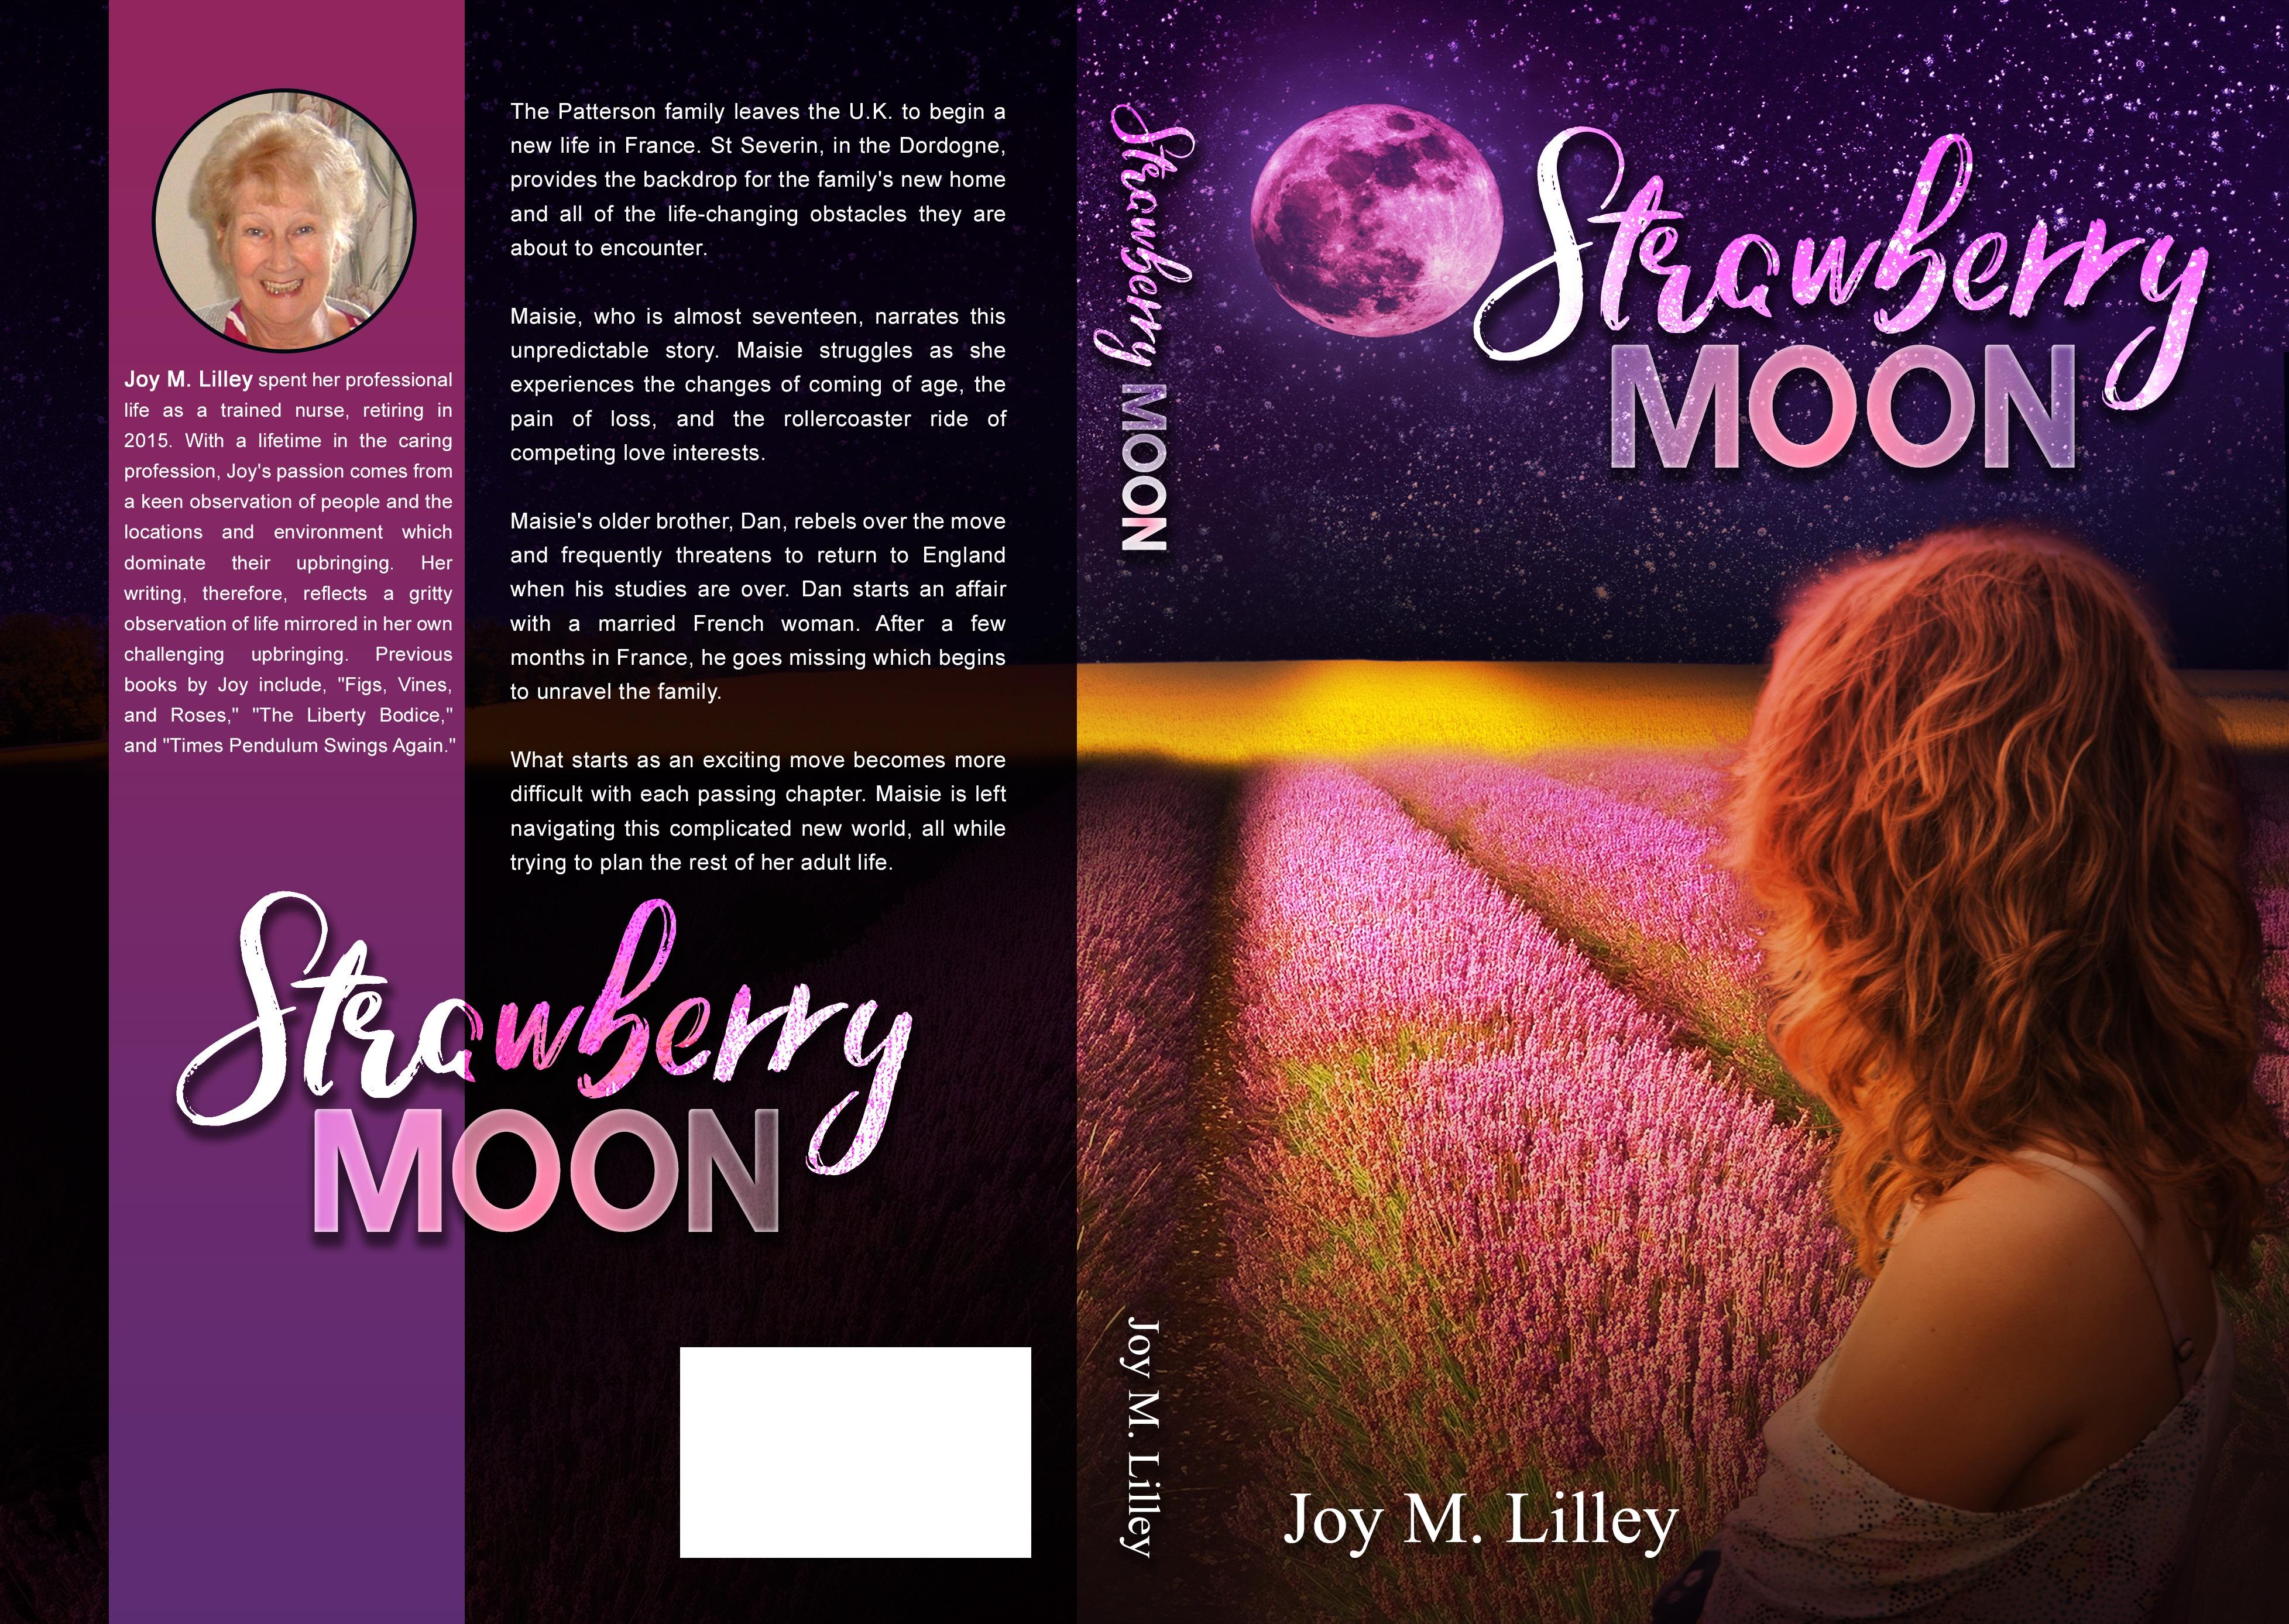 JPGStrawberry Moon 1.jpg